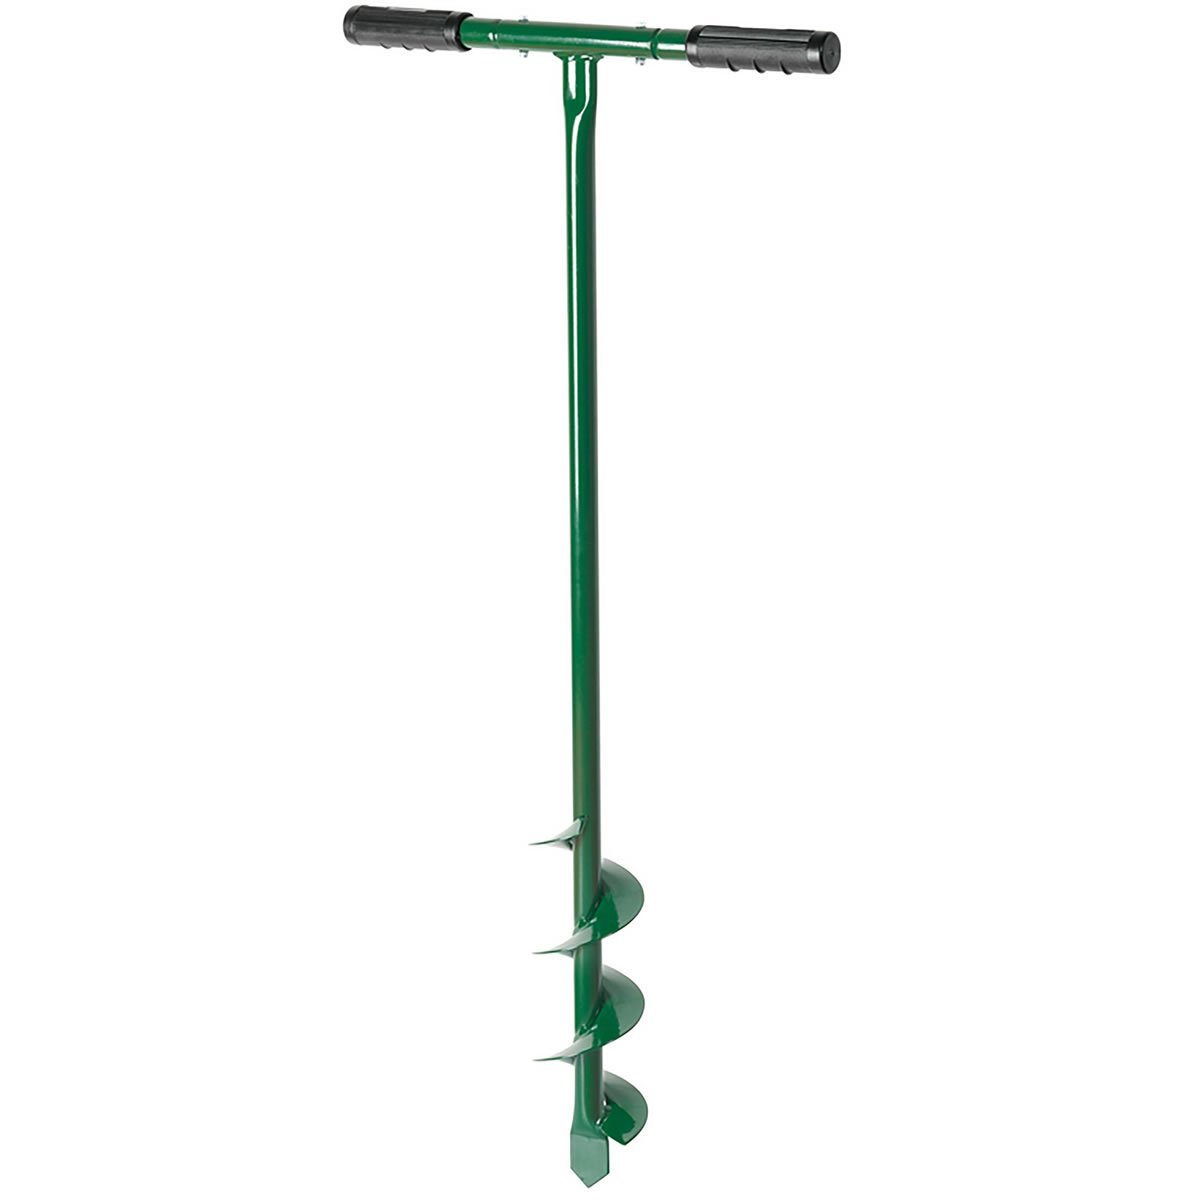 Ribiland PRTARMAN Trivella Manuale, Diametro 10x100 cm, Verde, 100x3x71 cm Ribimex 1400